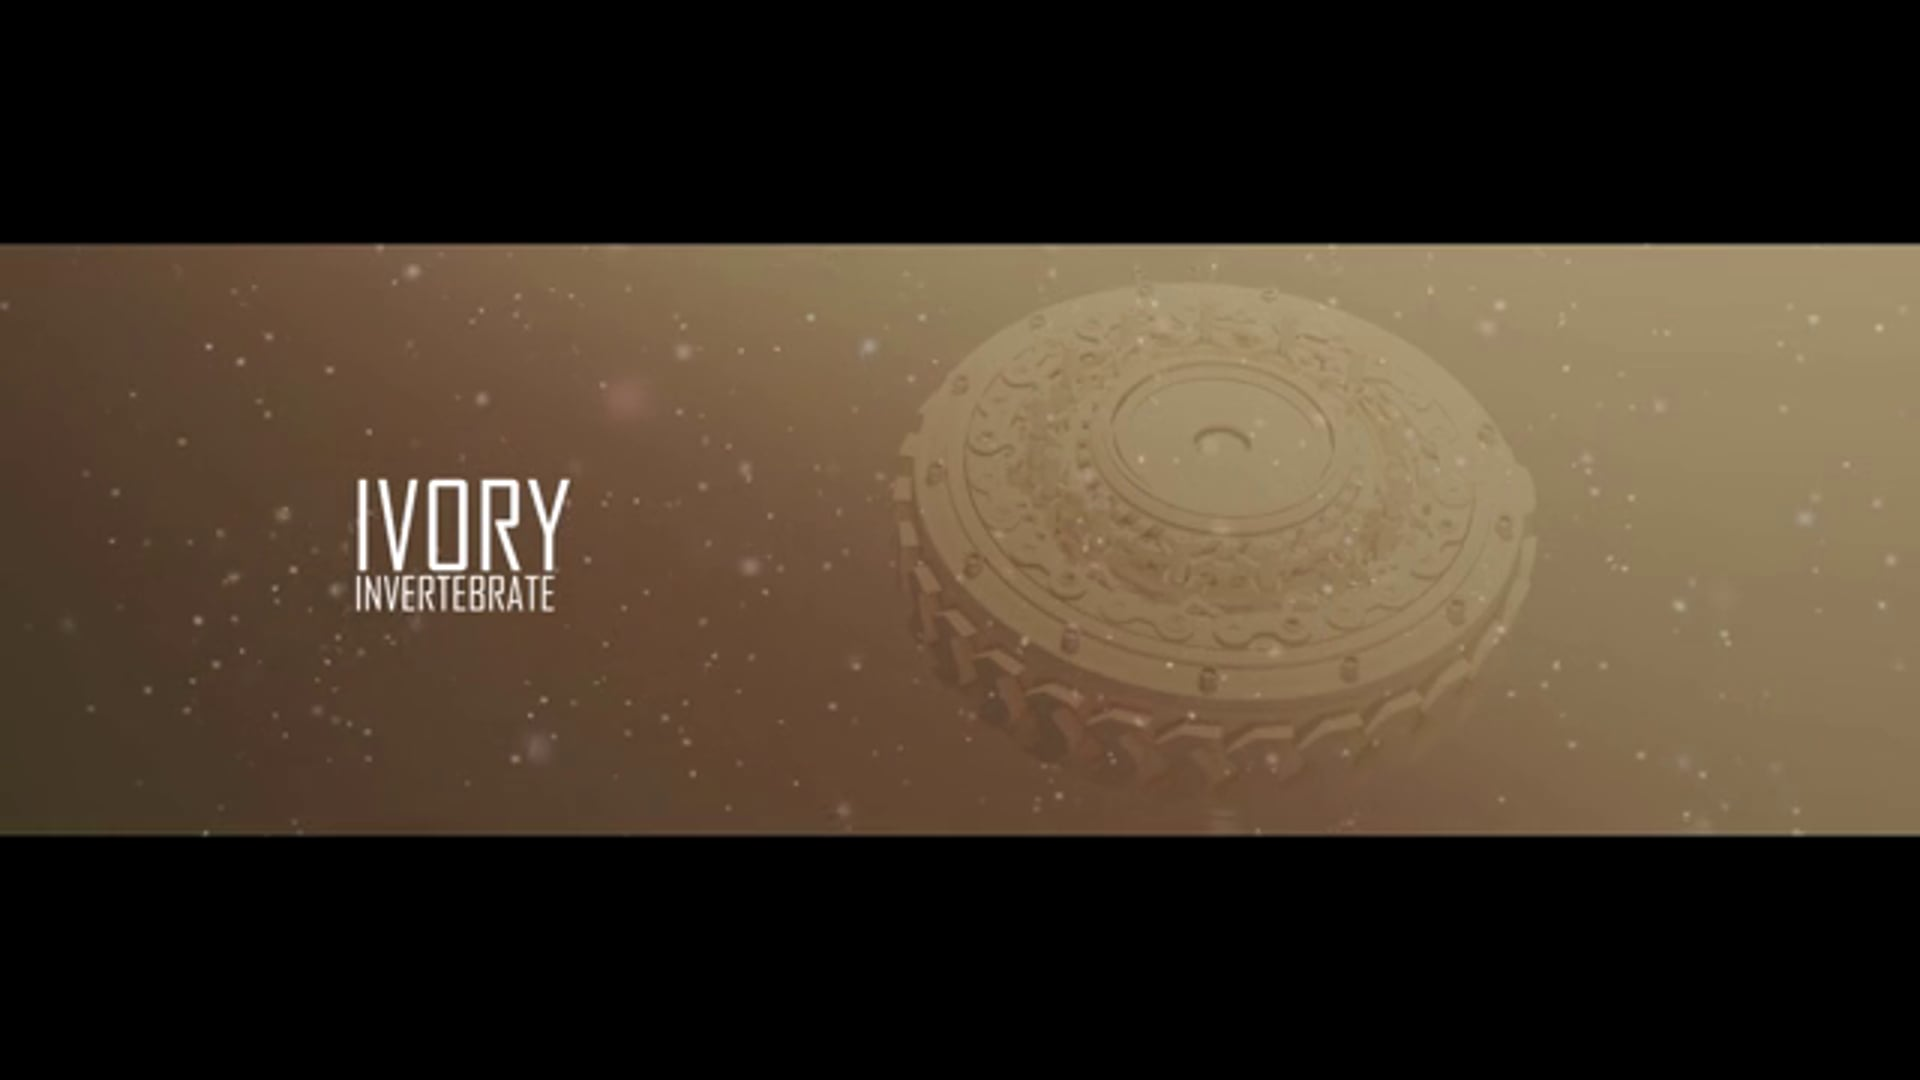 IVORY INVERTEBRATE - SOUND TRACK